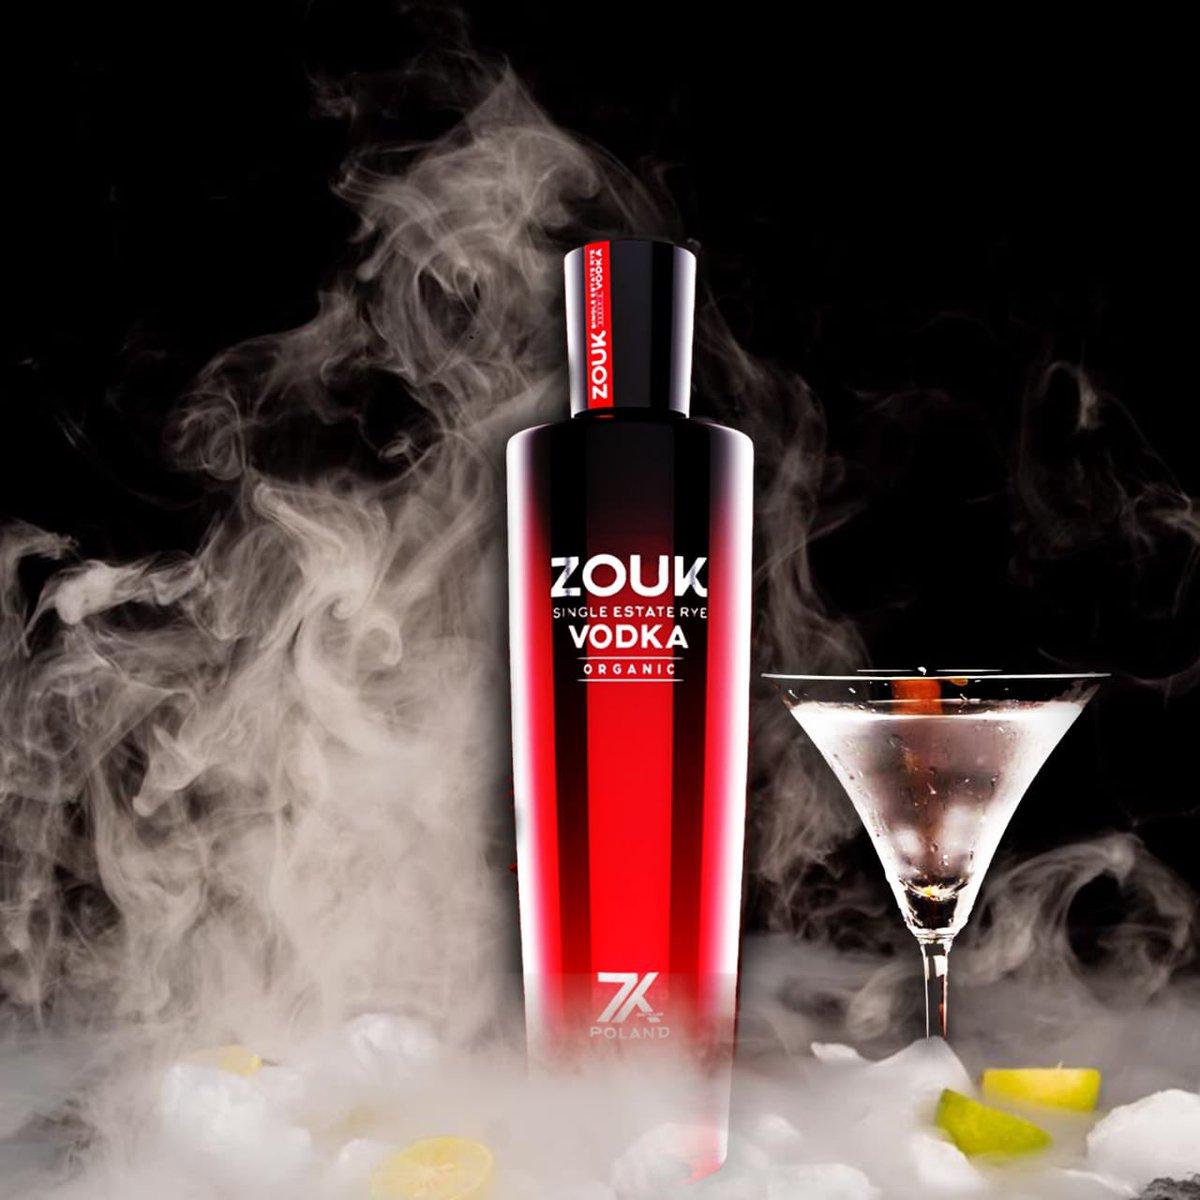 Table Check- Zouk Vodka ✅    Beat the cold night with Zouk Vodka   #zoukVodka #sundaymood☀️ #winter #eveningmood✨ #loveforvodka #vodkalover #vodka